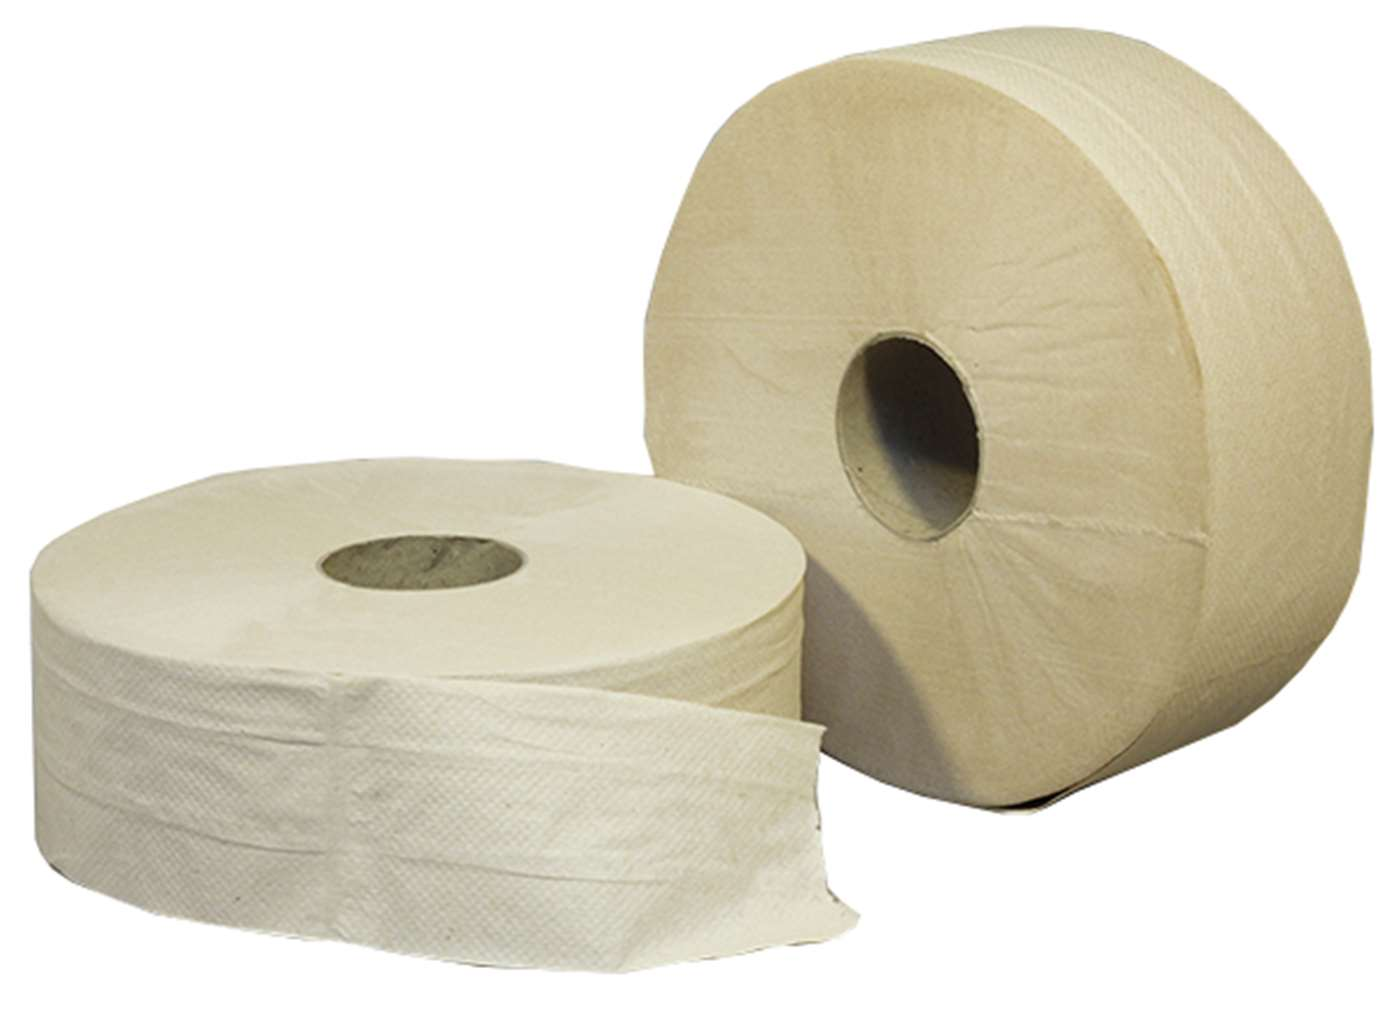 EcoNatural Jumbo Toilet Rolls 270m (60mm core)